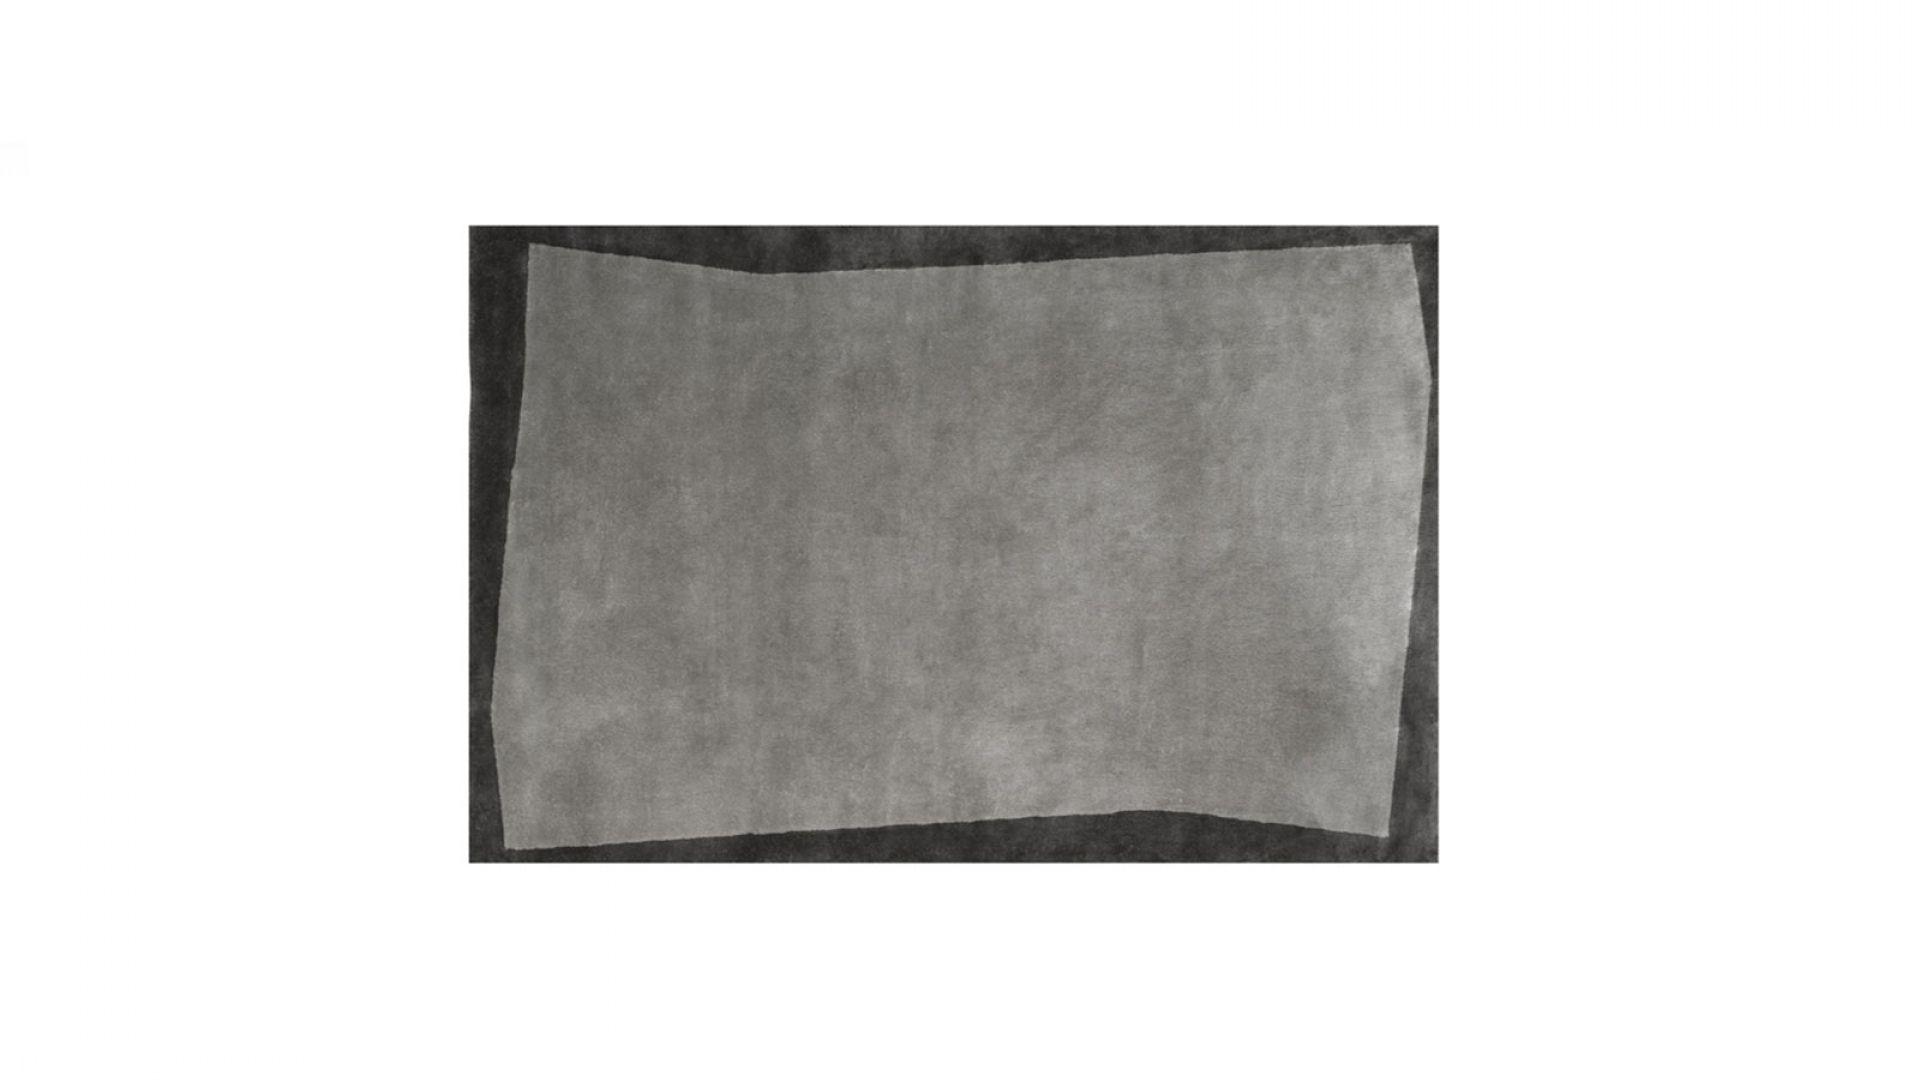 r860vgx-marcus-grey-ritoc-1920x1080